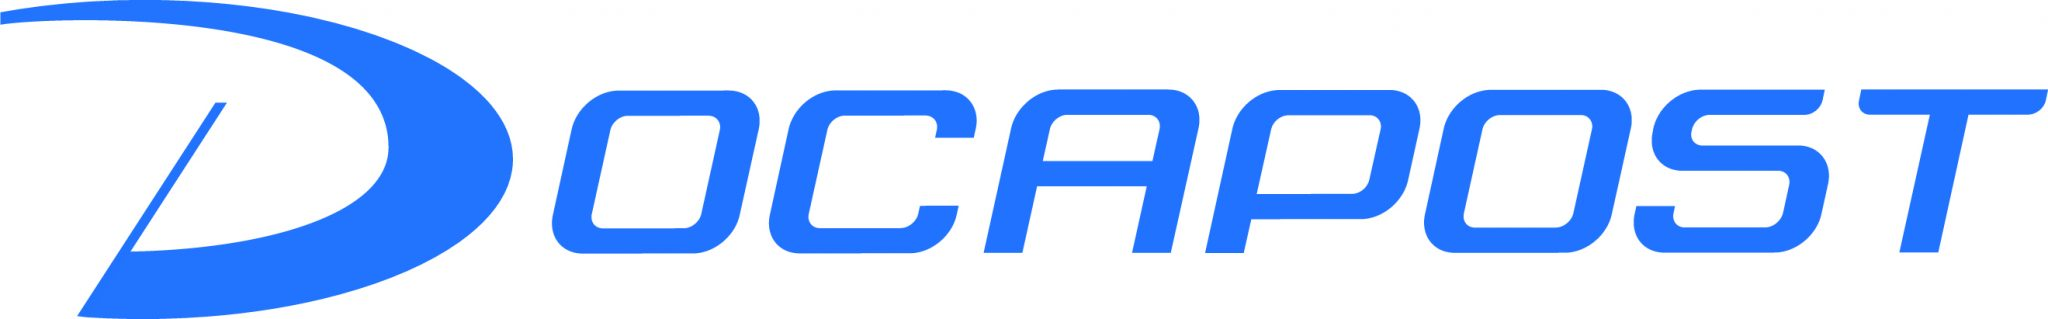 Logo Docapost